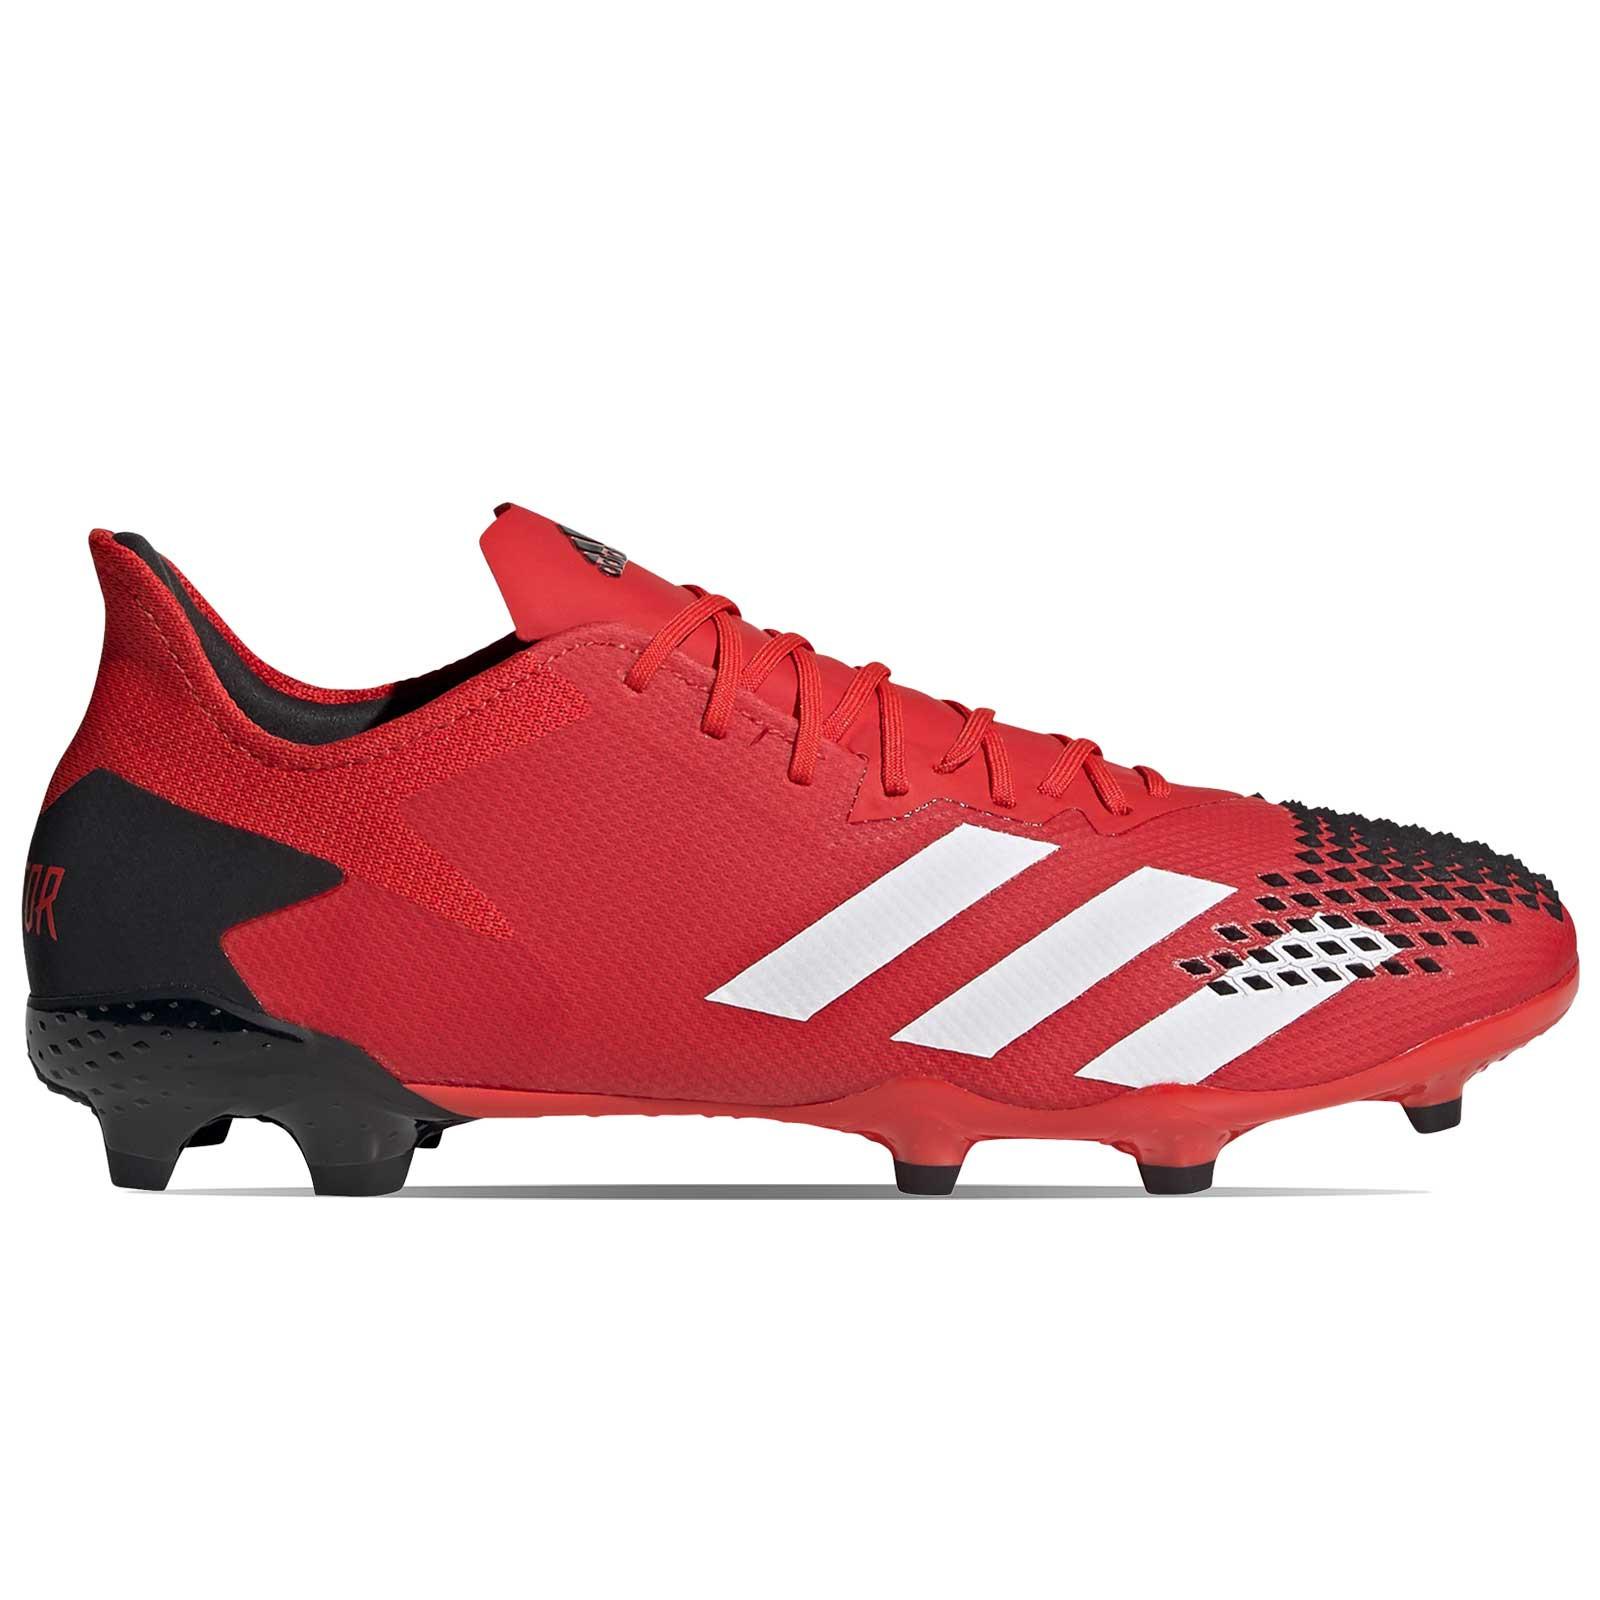 Porque ira Desde  Botas adidas Predator 20.2 FG rojas y negras | futbolmania